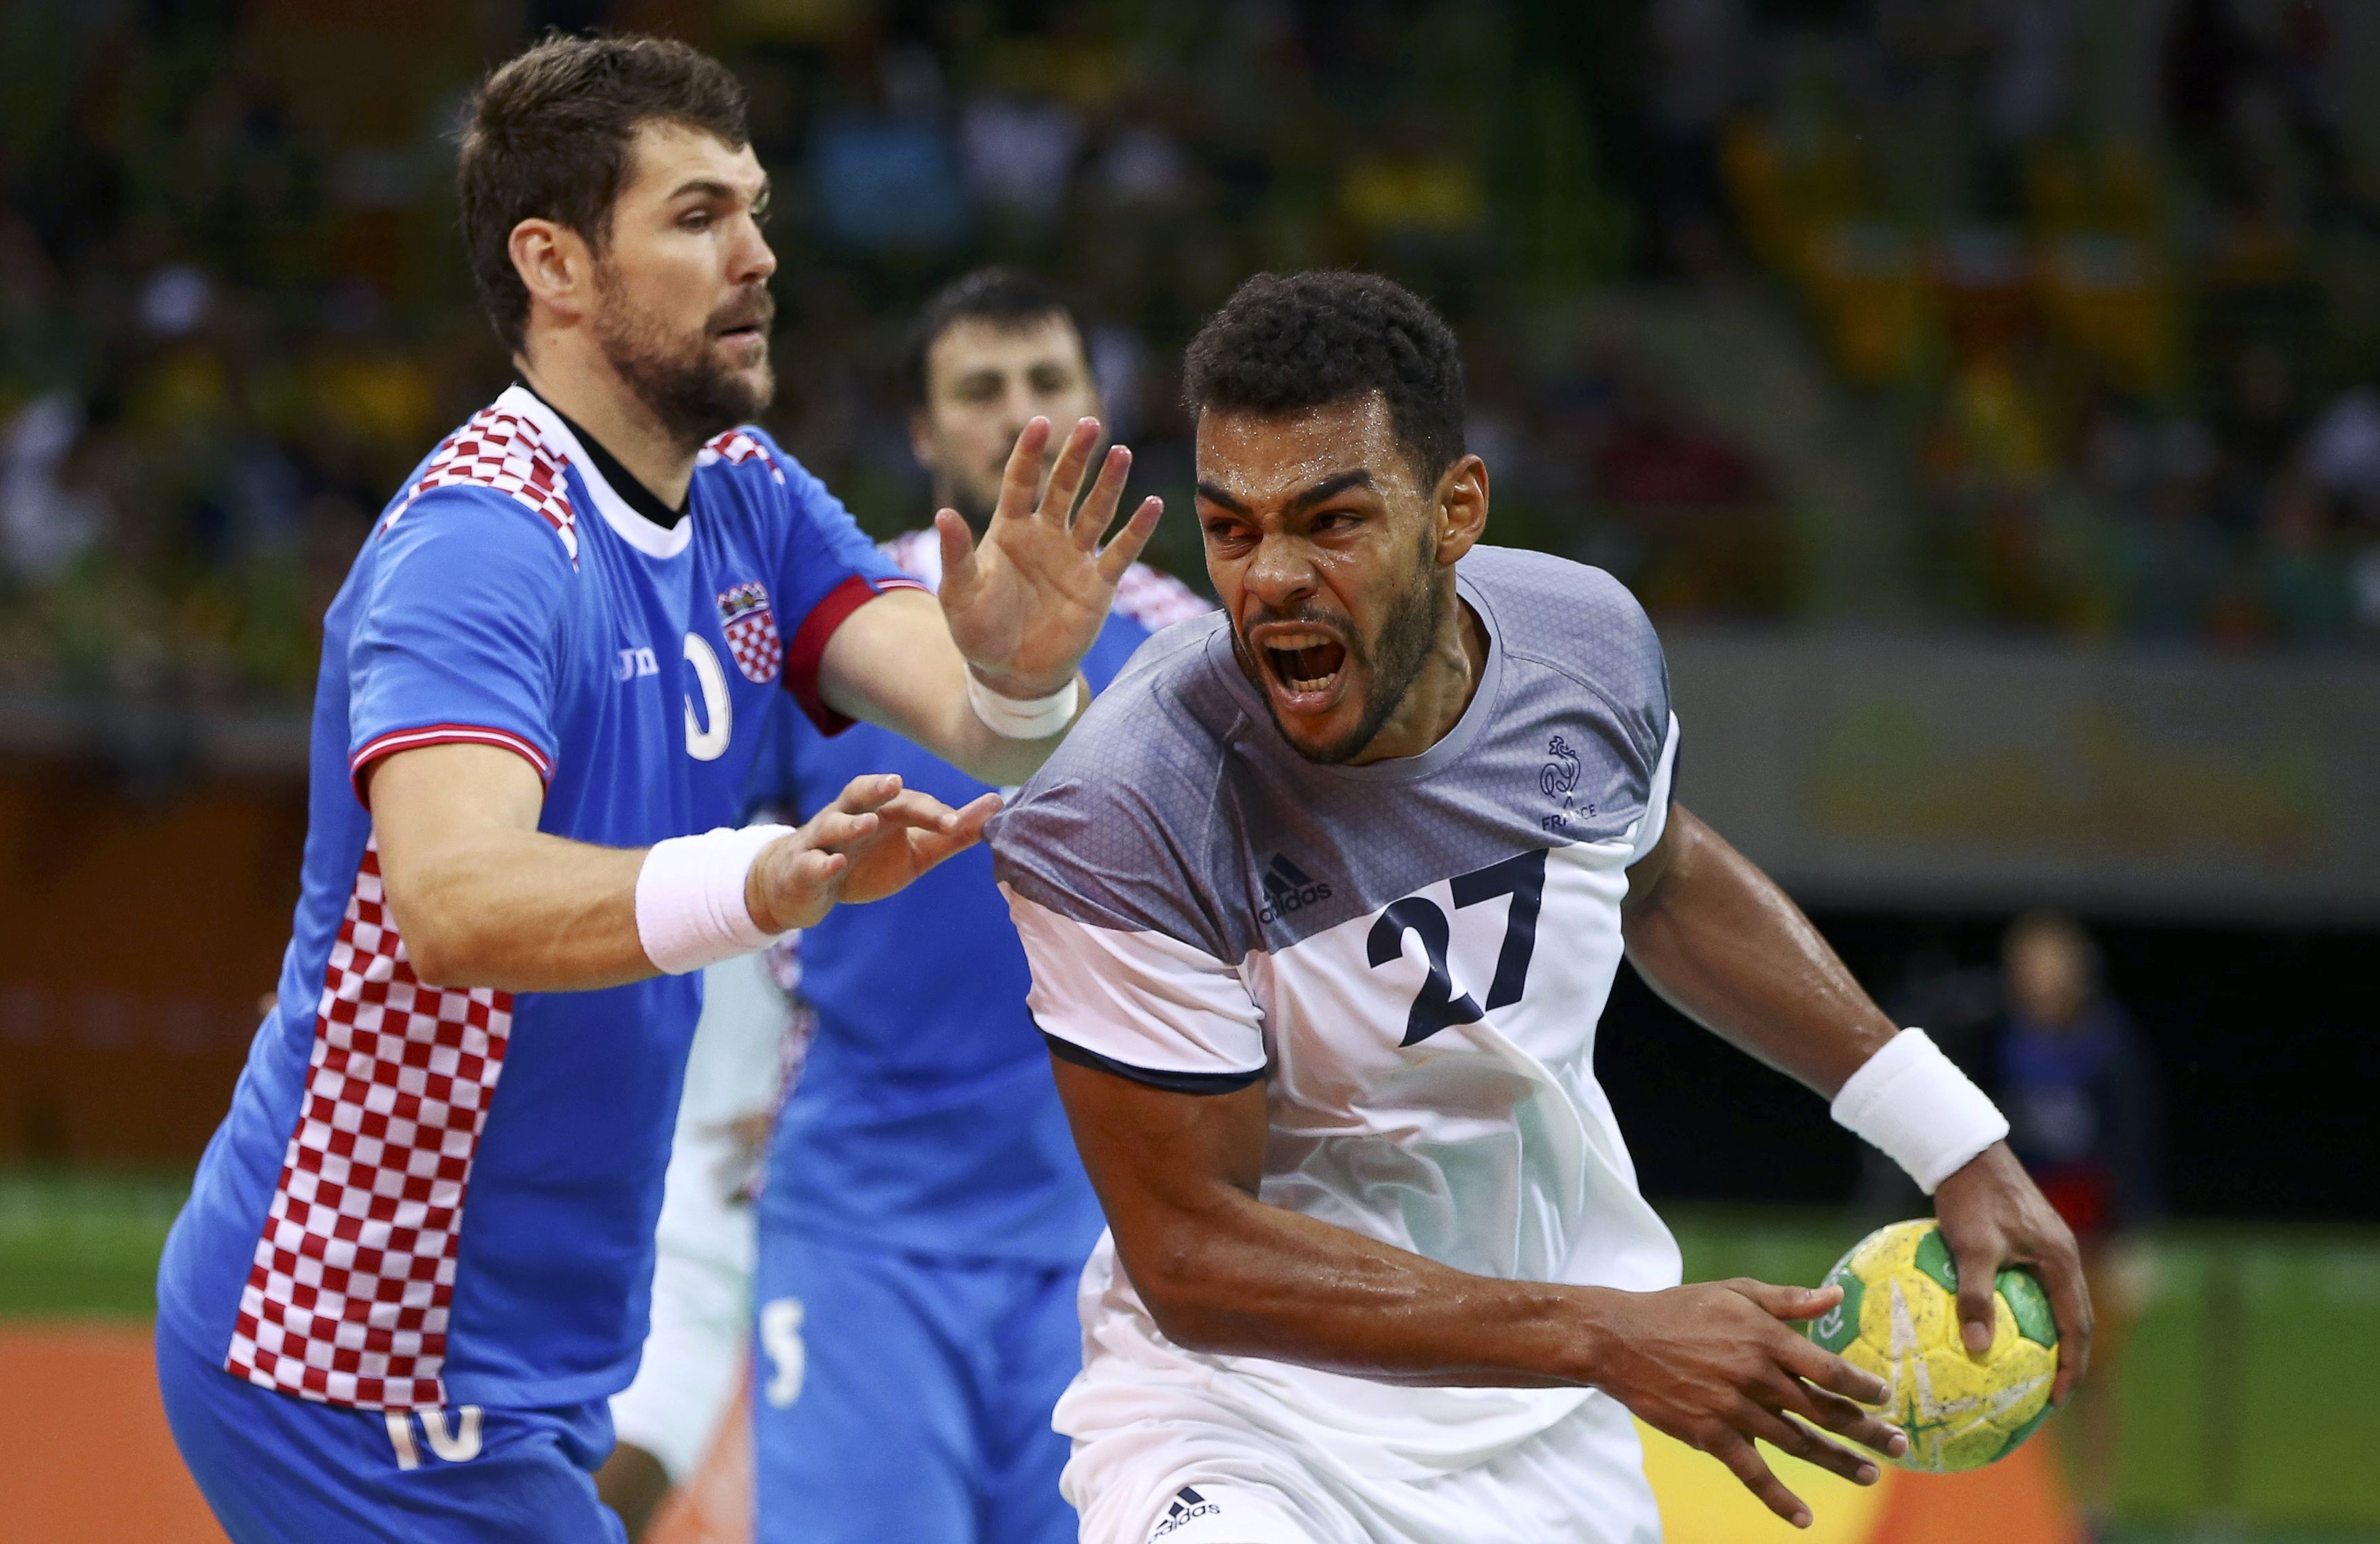 Handball - Equipe de France - France-Croatie, vrai ou faux choc ?